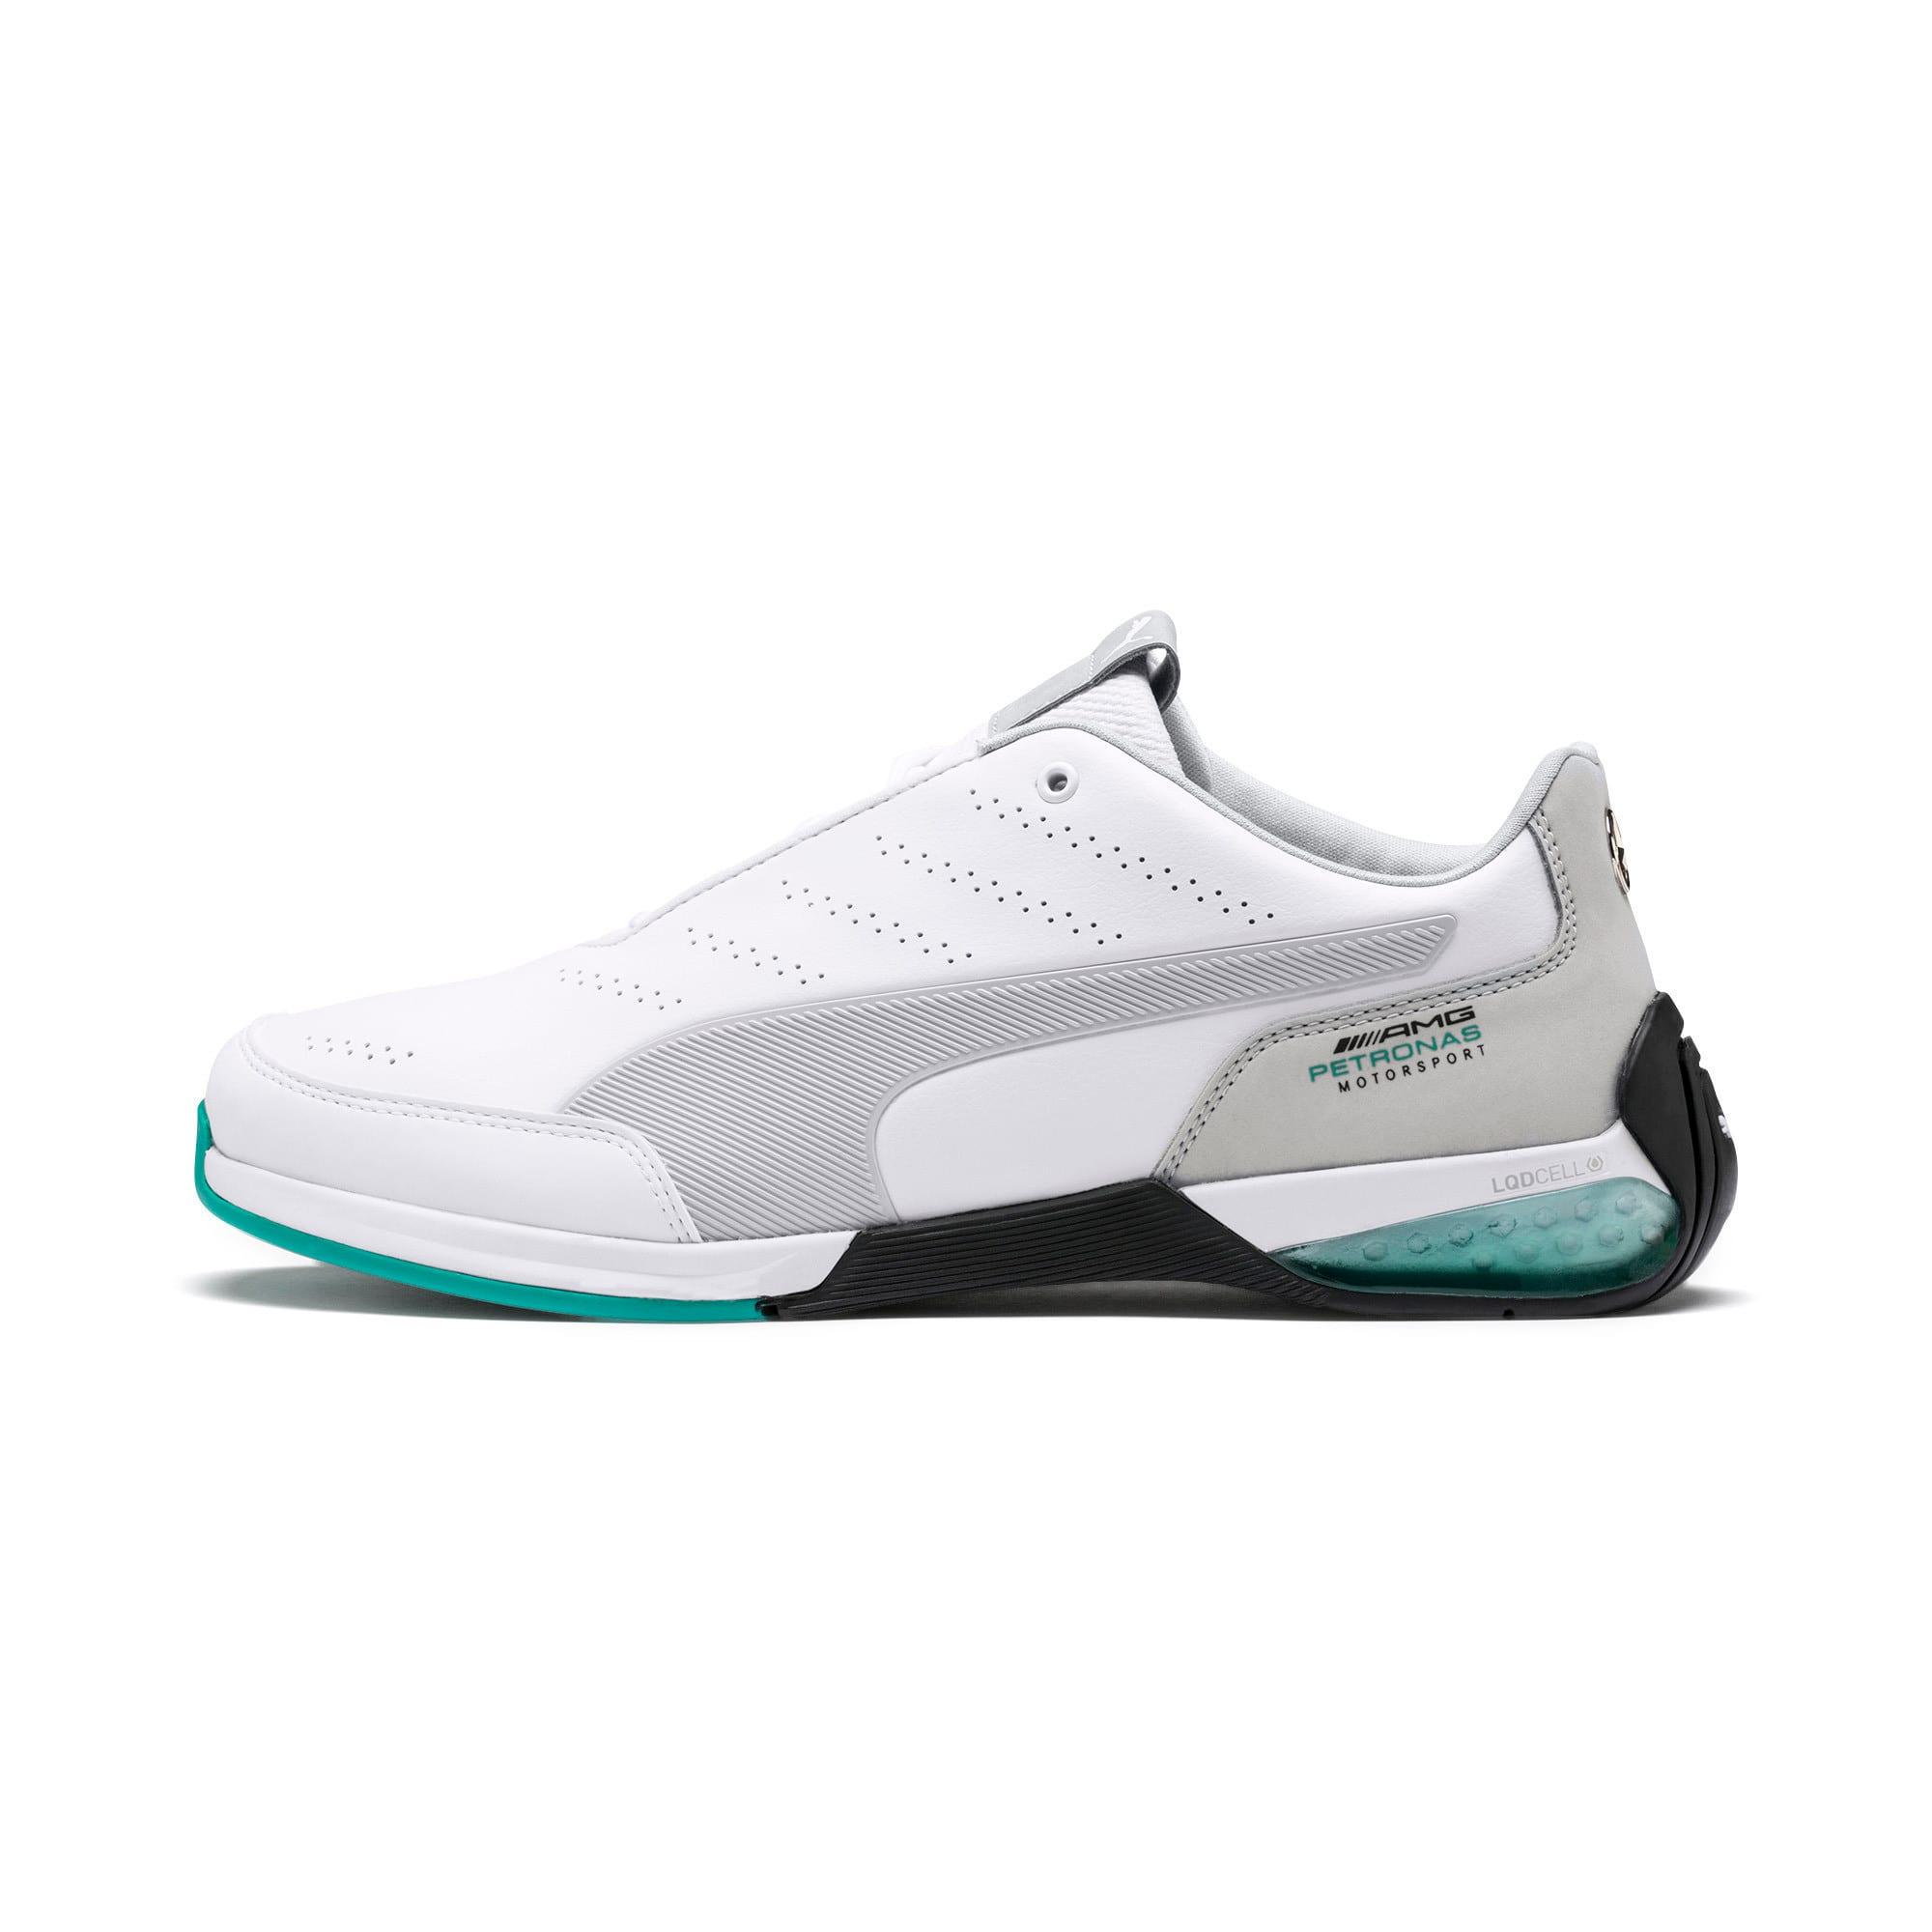 Thumbnail 1 of Mercedes AMG Petronas Kart Cat X Men's Training Shoes, Puma White-Mercedes Silver, medium